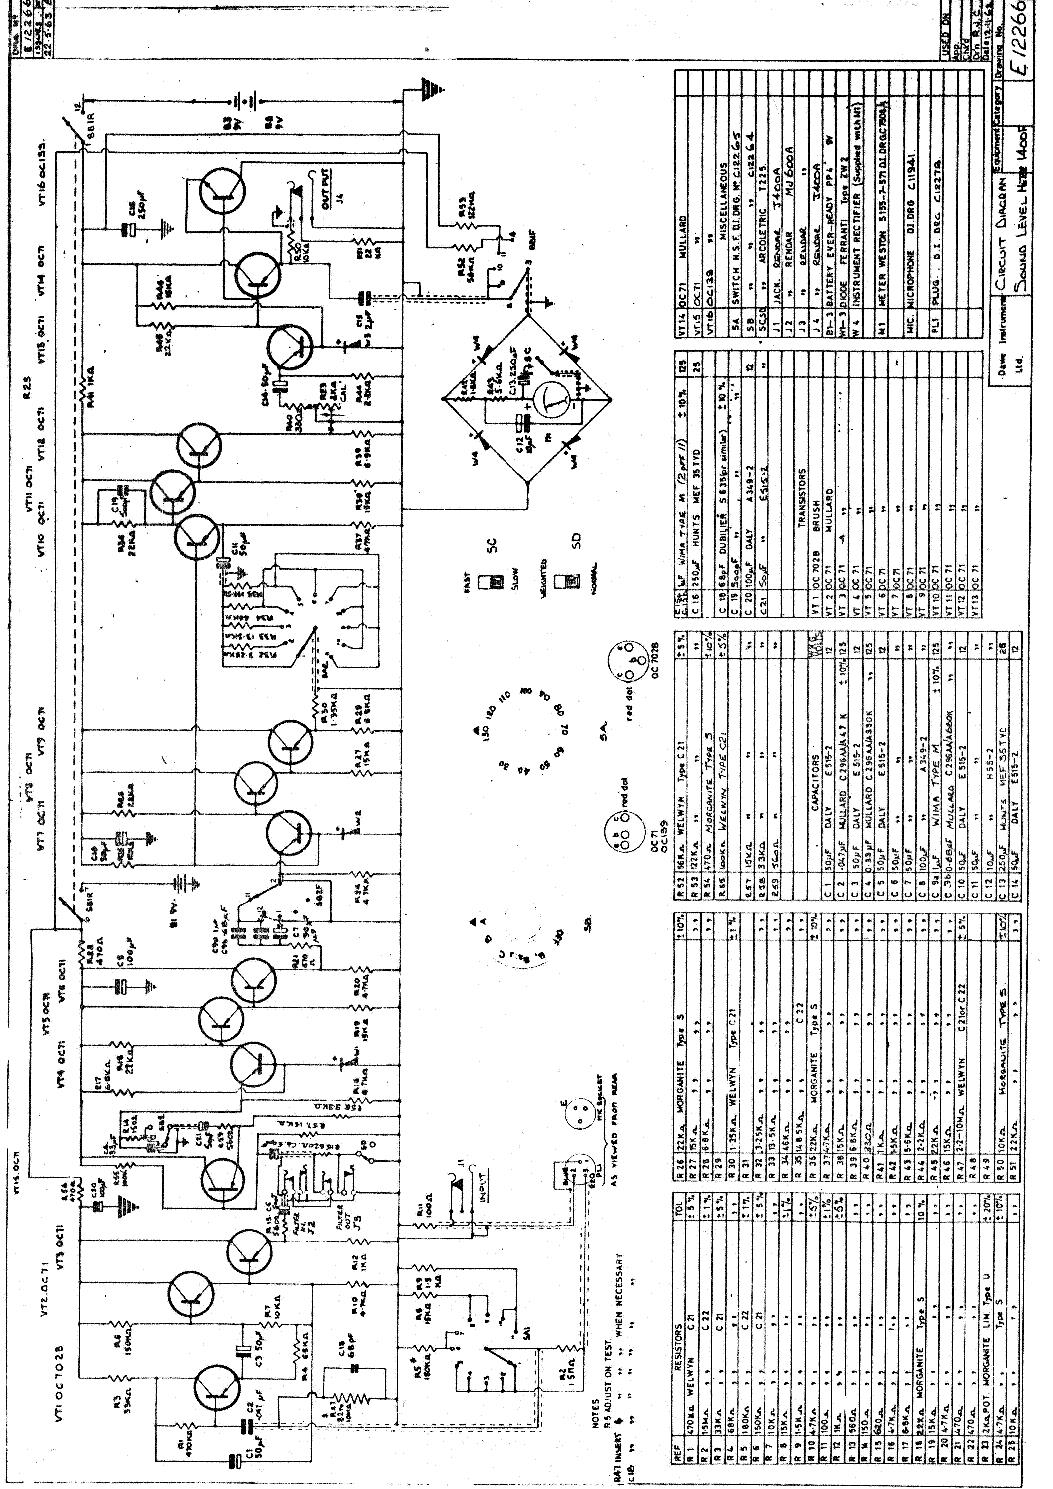 dawe 1400f sound level meter sch service manual download